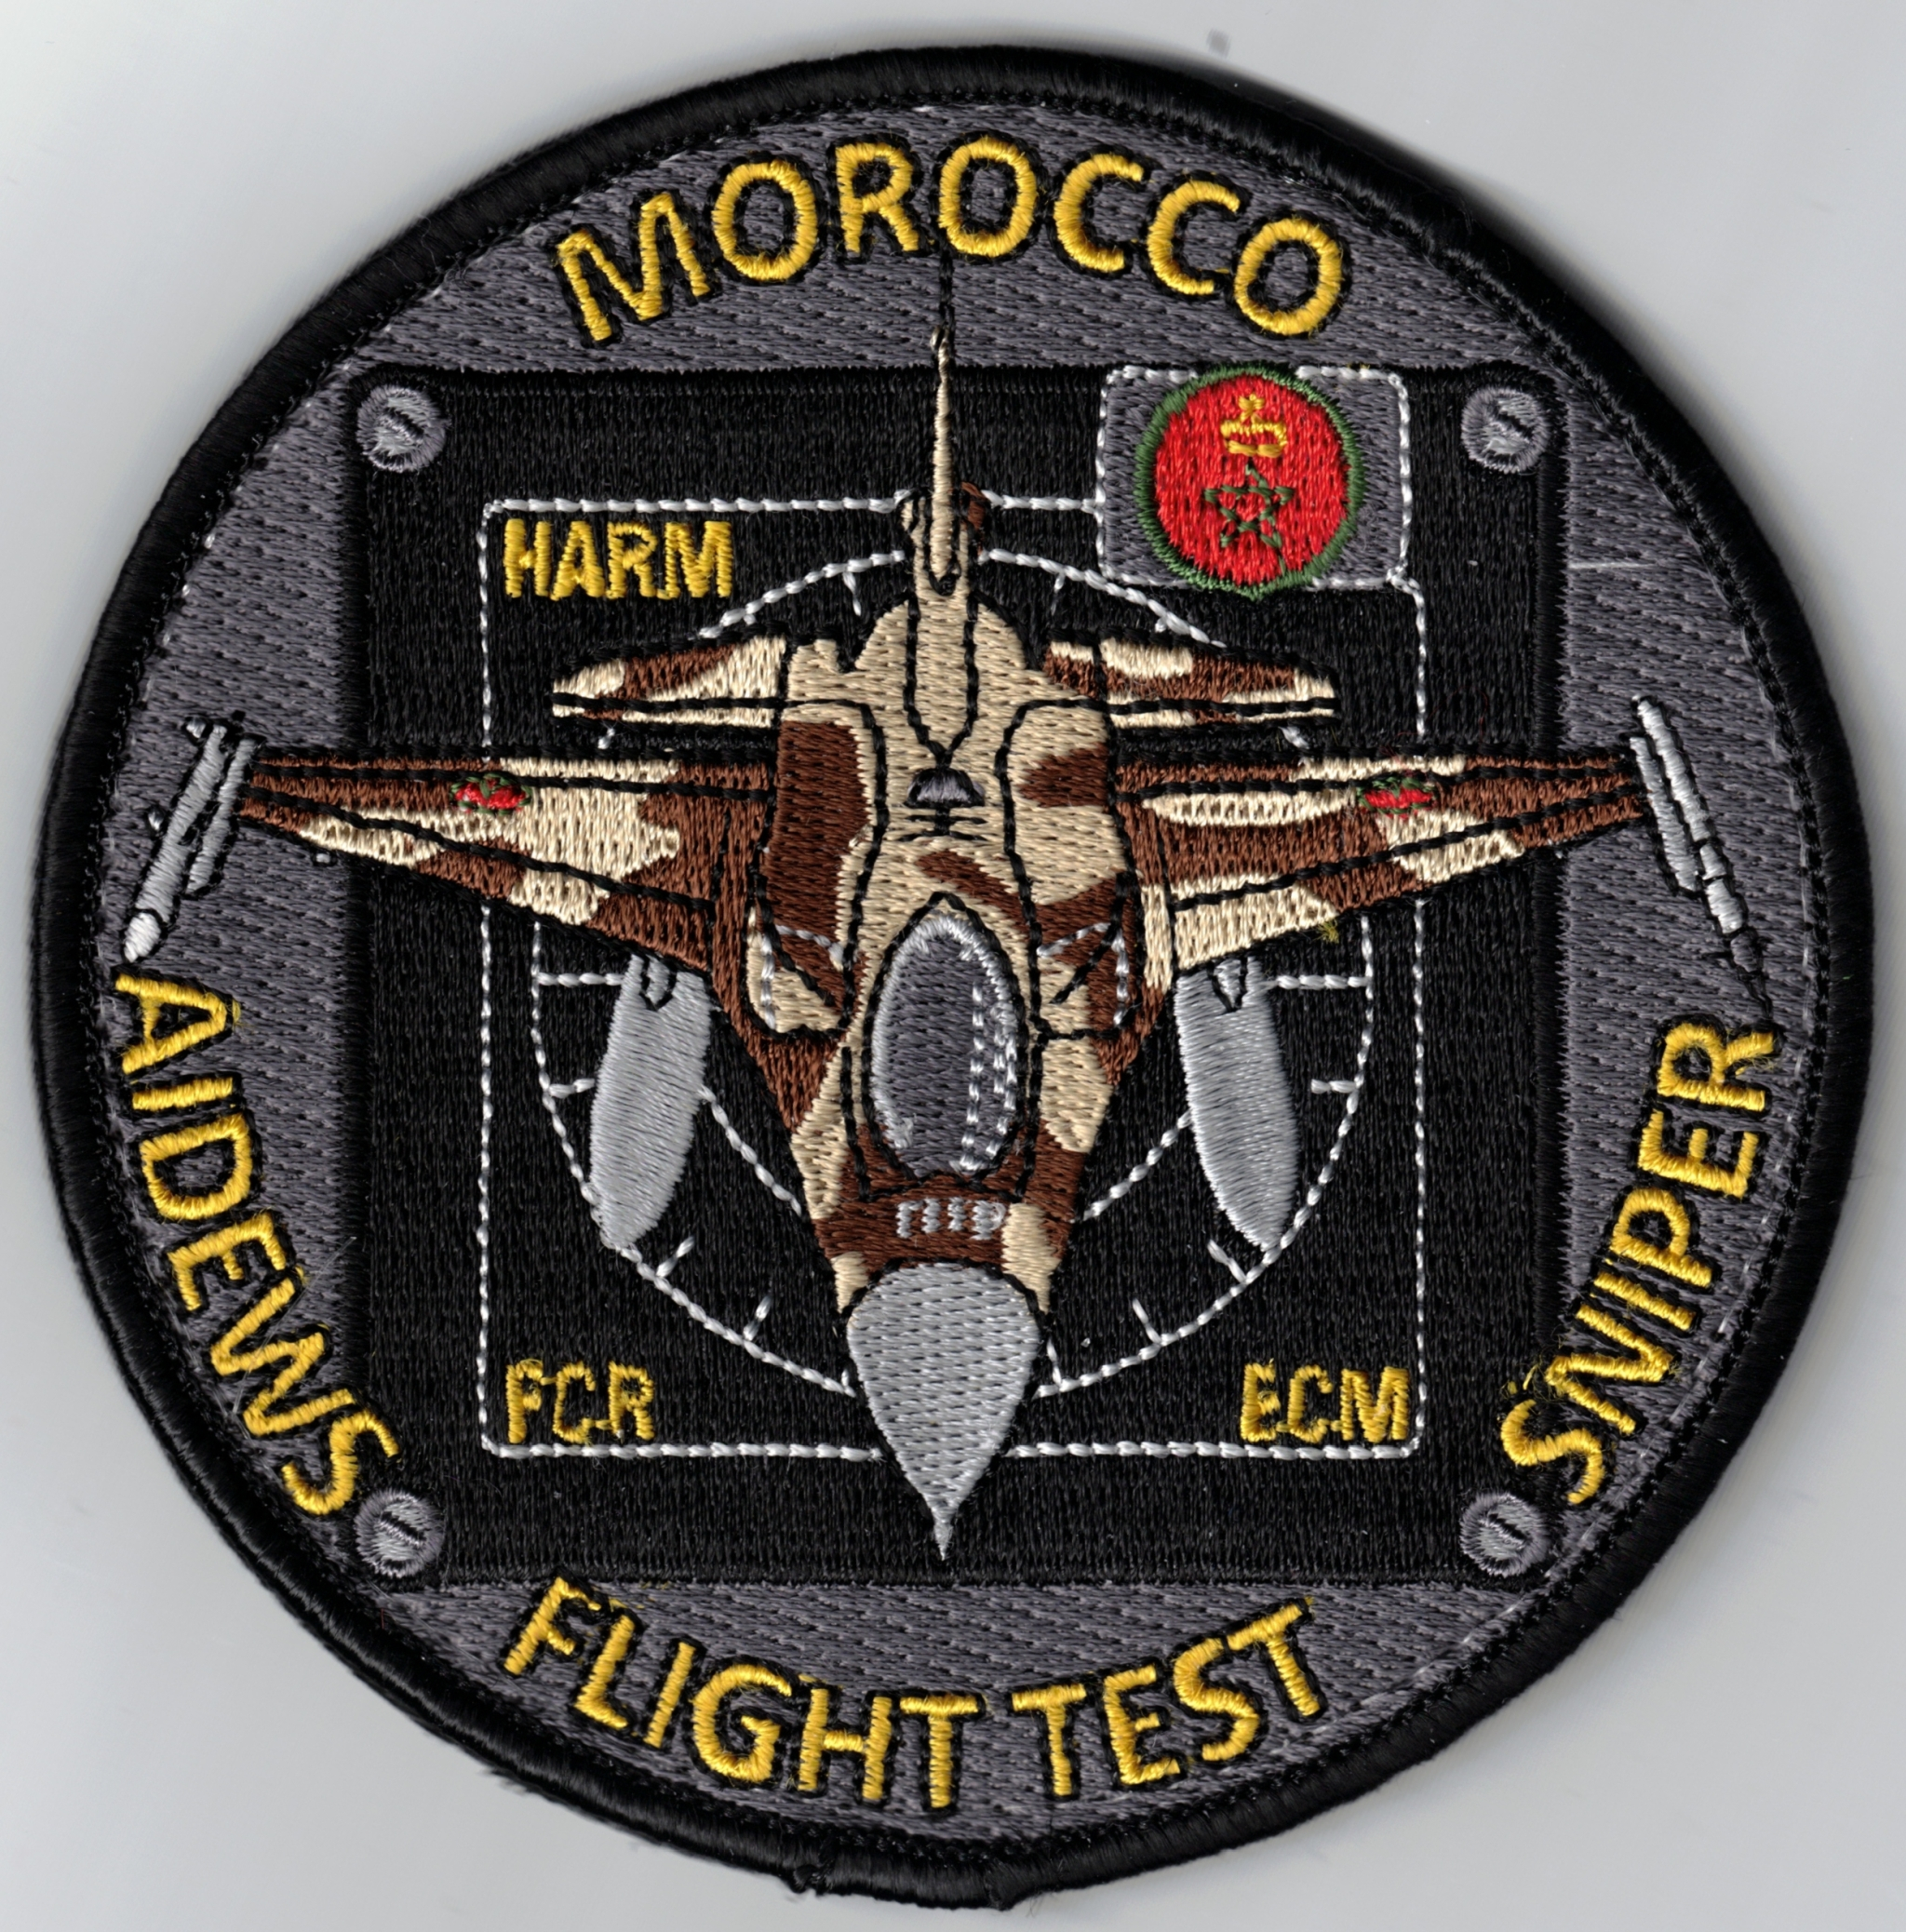 RMAF insignia Swirls Patches / Ecussons,cocardes et Insignes Des FRA - Page 8 49653160457_96dec77eee_o_d